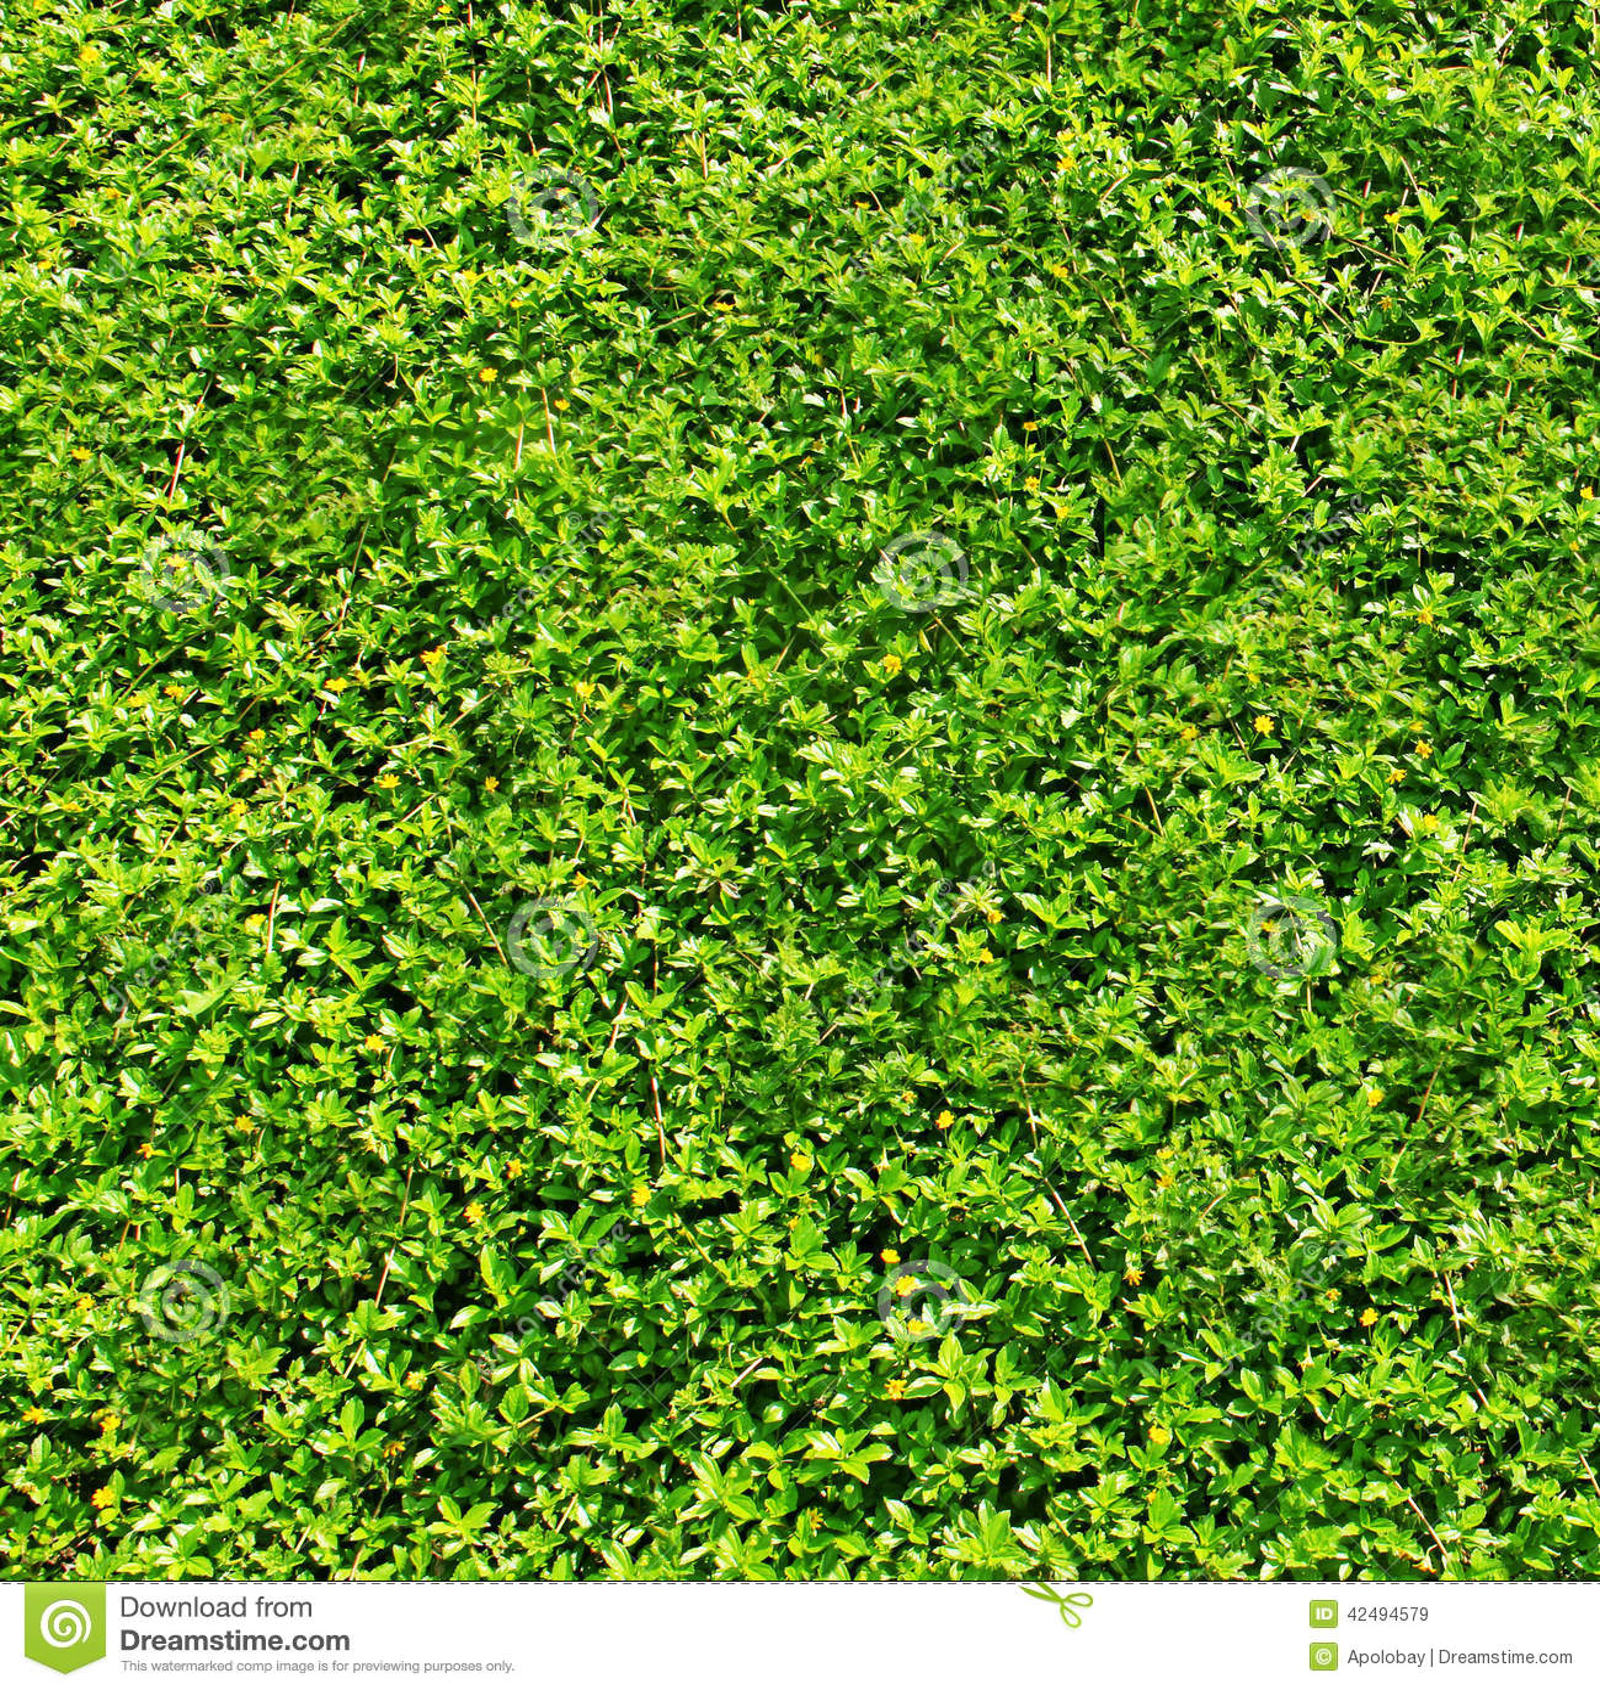 Texture Fresh Green Grass Or Foliage Stock Photo Image